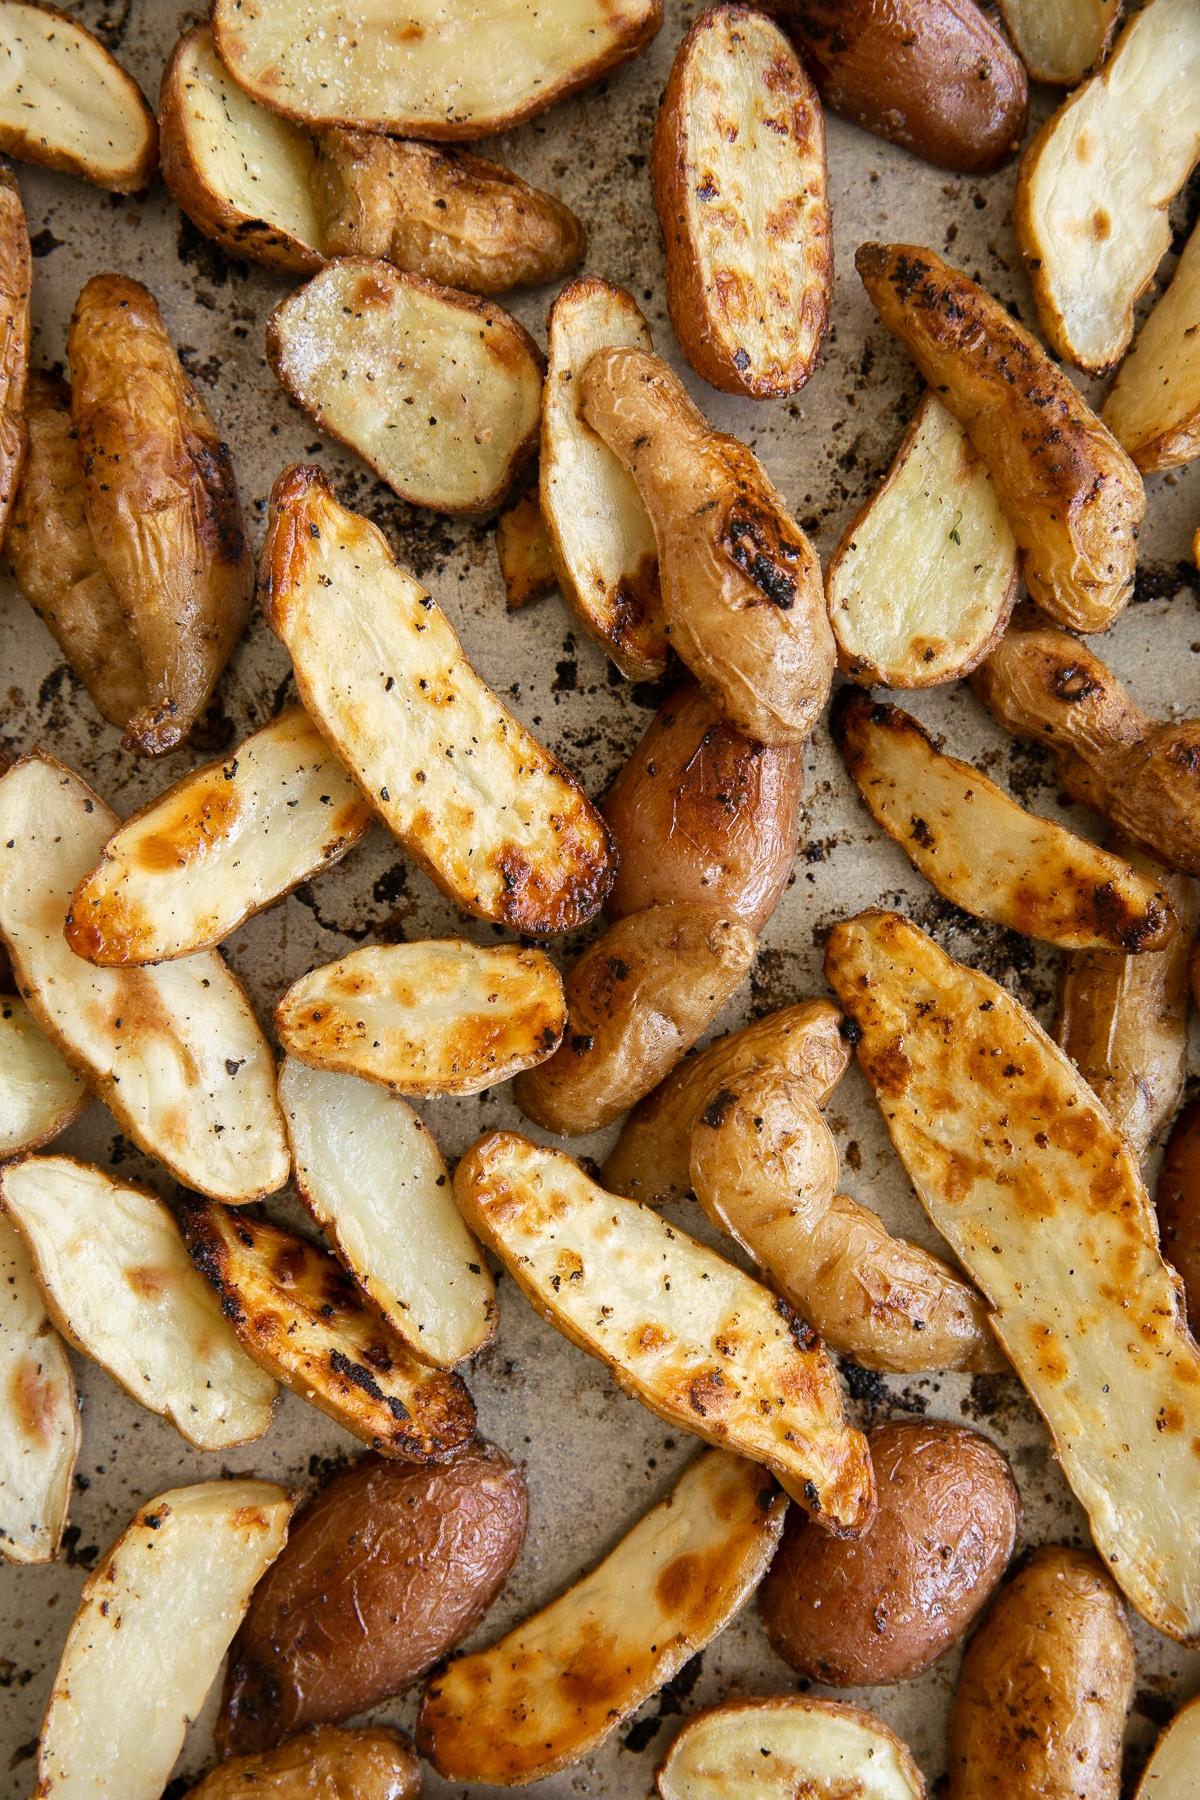 Roasted fingerling potatoes on a large baking sheet.